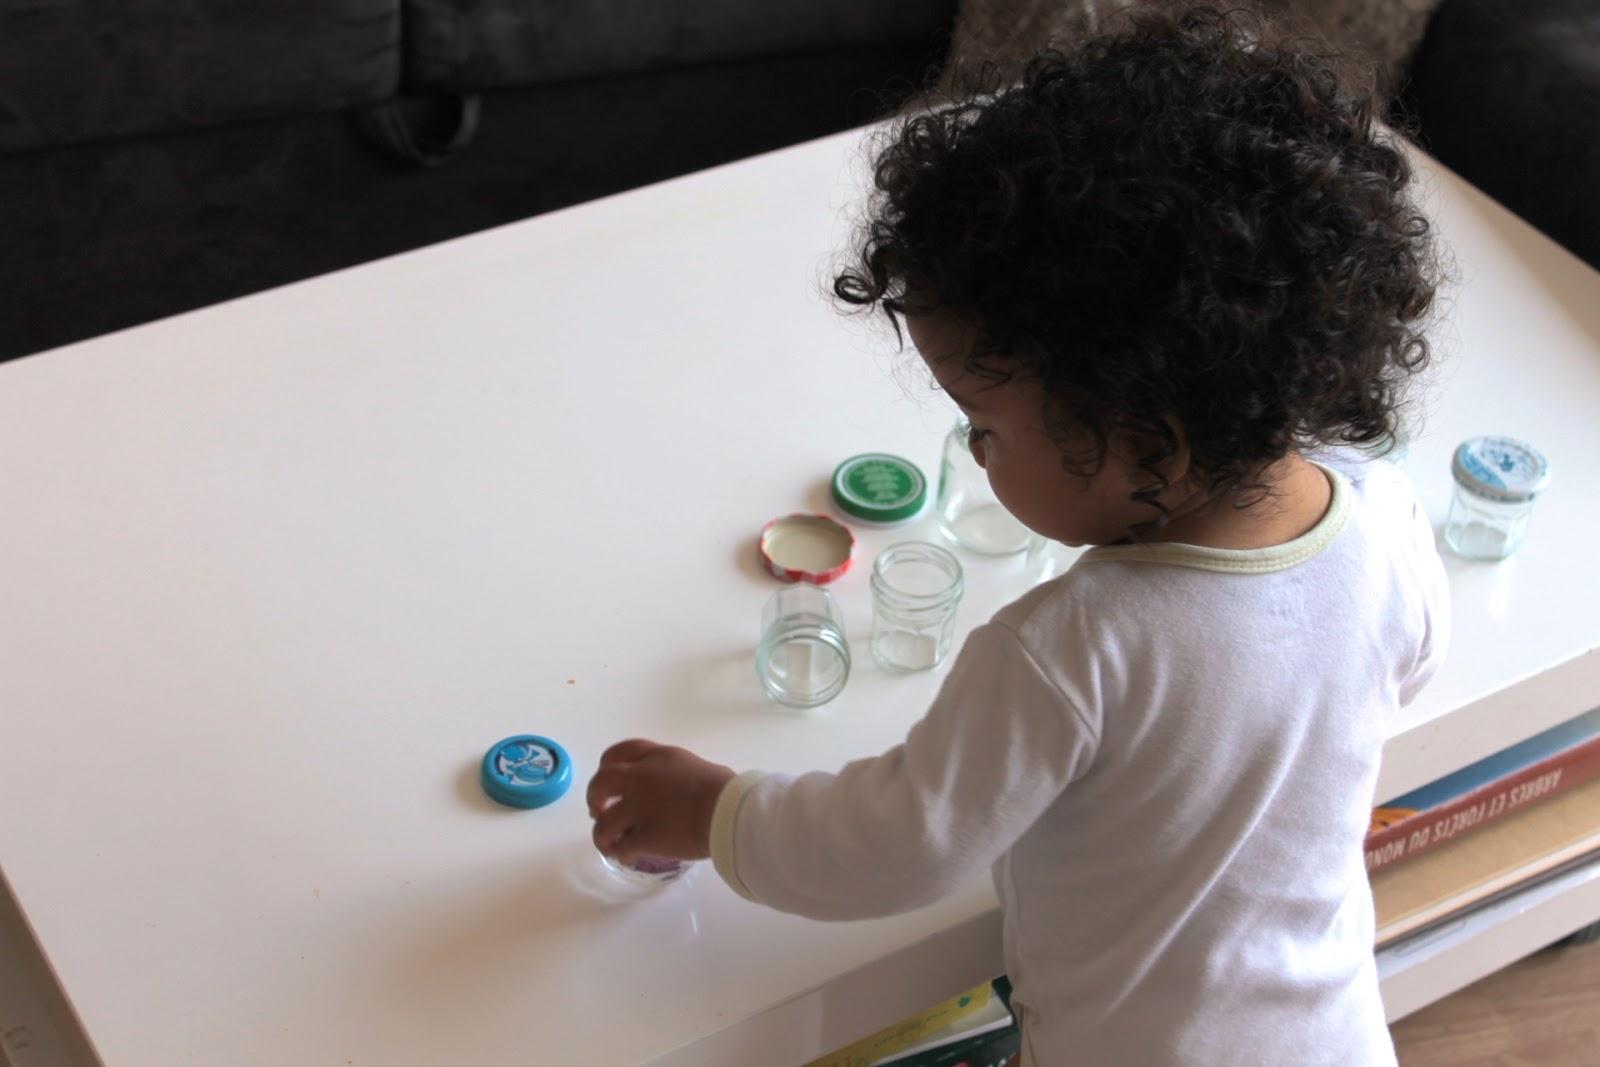 Montessori - Visser devisser